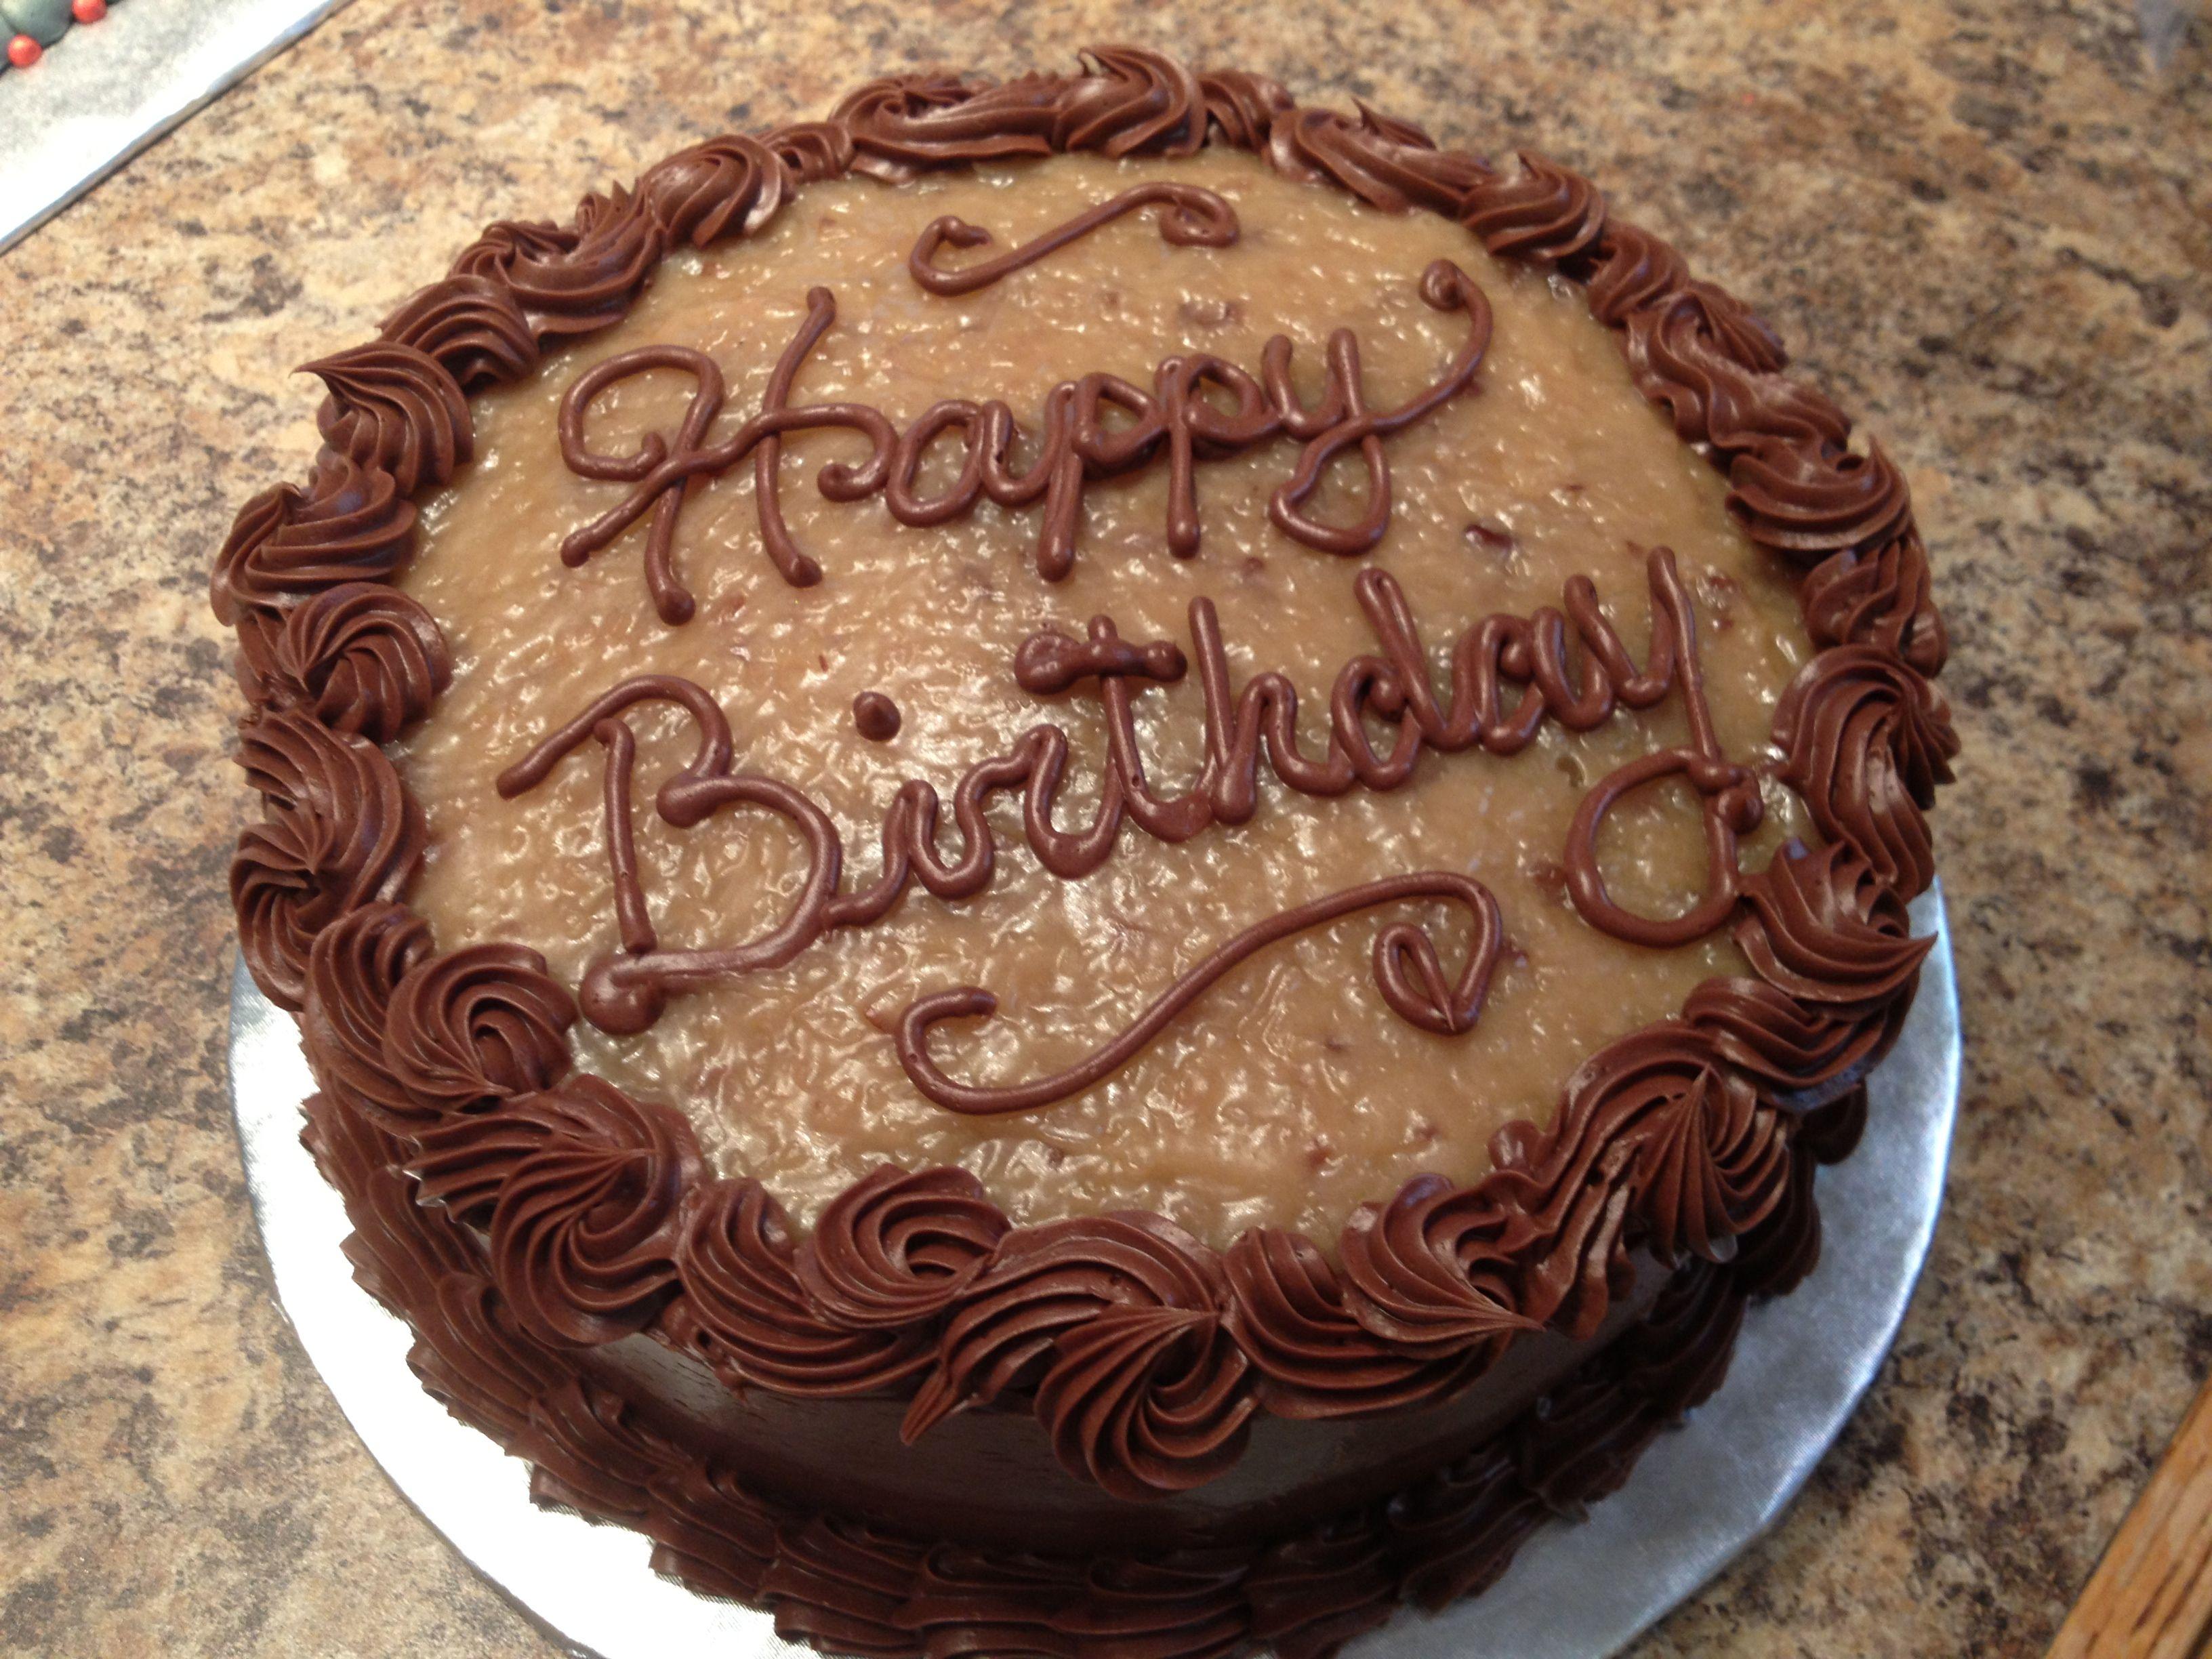 Decorated German Chocolate Cake German Chocolate Birthday Cake By Karens Kaykes Karens Kaykes